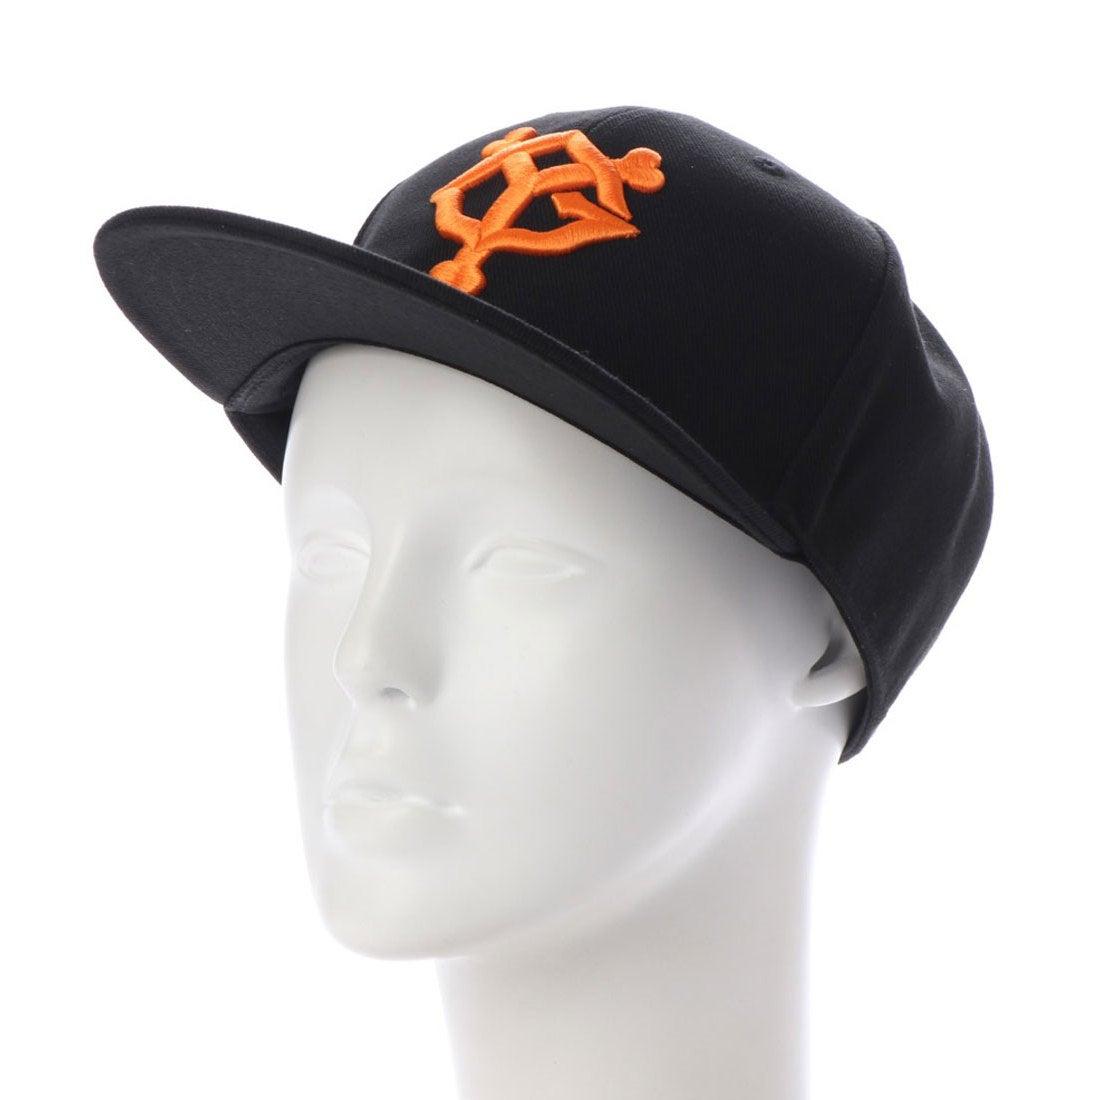 252e42b0ef24c アンダーアーマー UNDER ARMOUR メンズ 野球 キャップ UA GIANTS Flat Cap YG logo 1348121  -レディースファッション通販 ロコンドガールズコレクション (ロココレ)